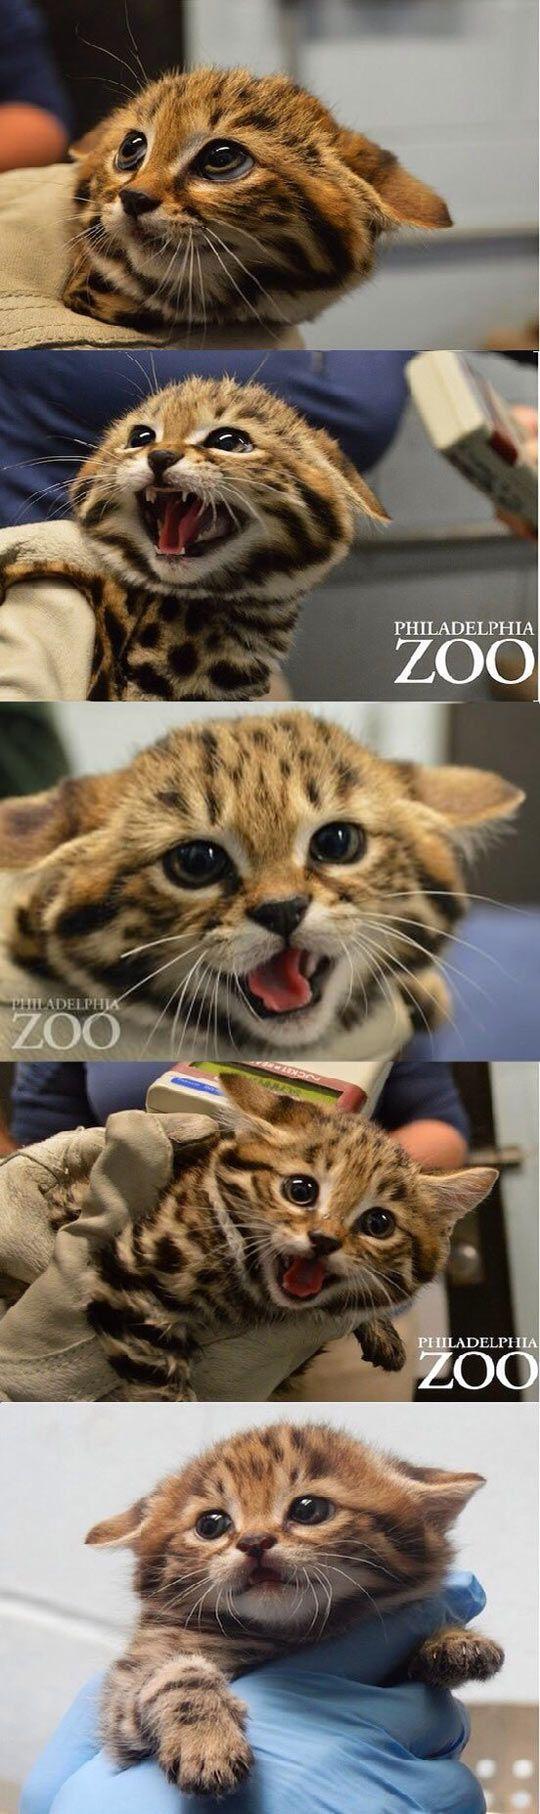 Fear My Wrath Humans Cute Animals Animals Beautiful Baby Animals